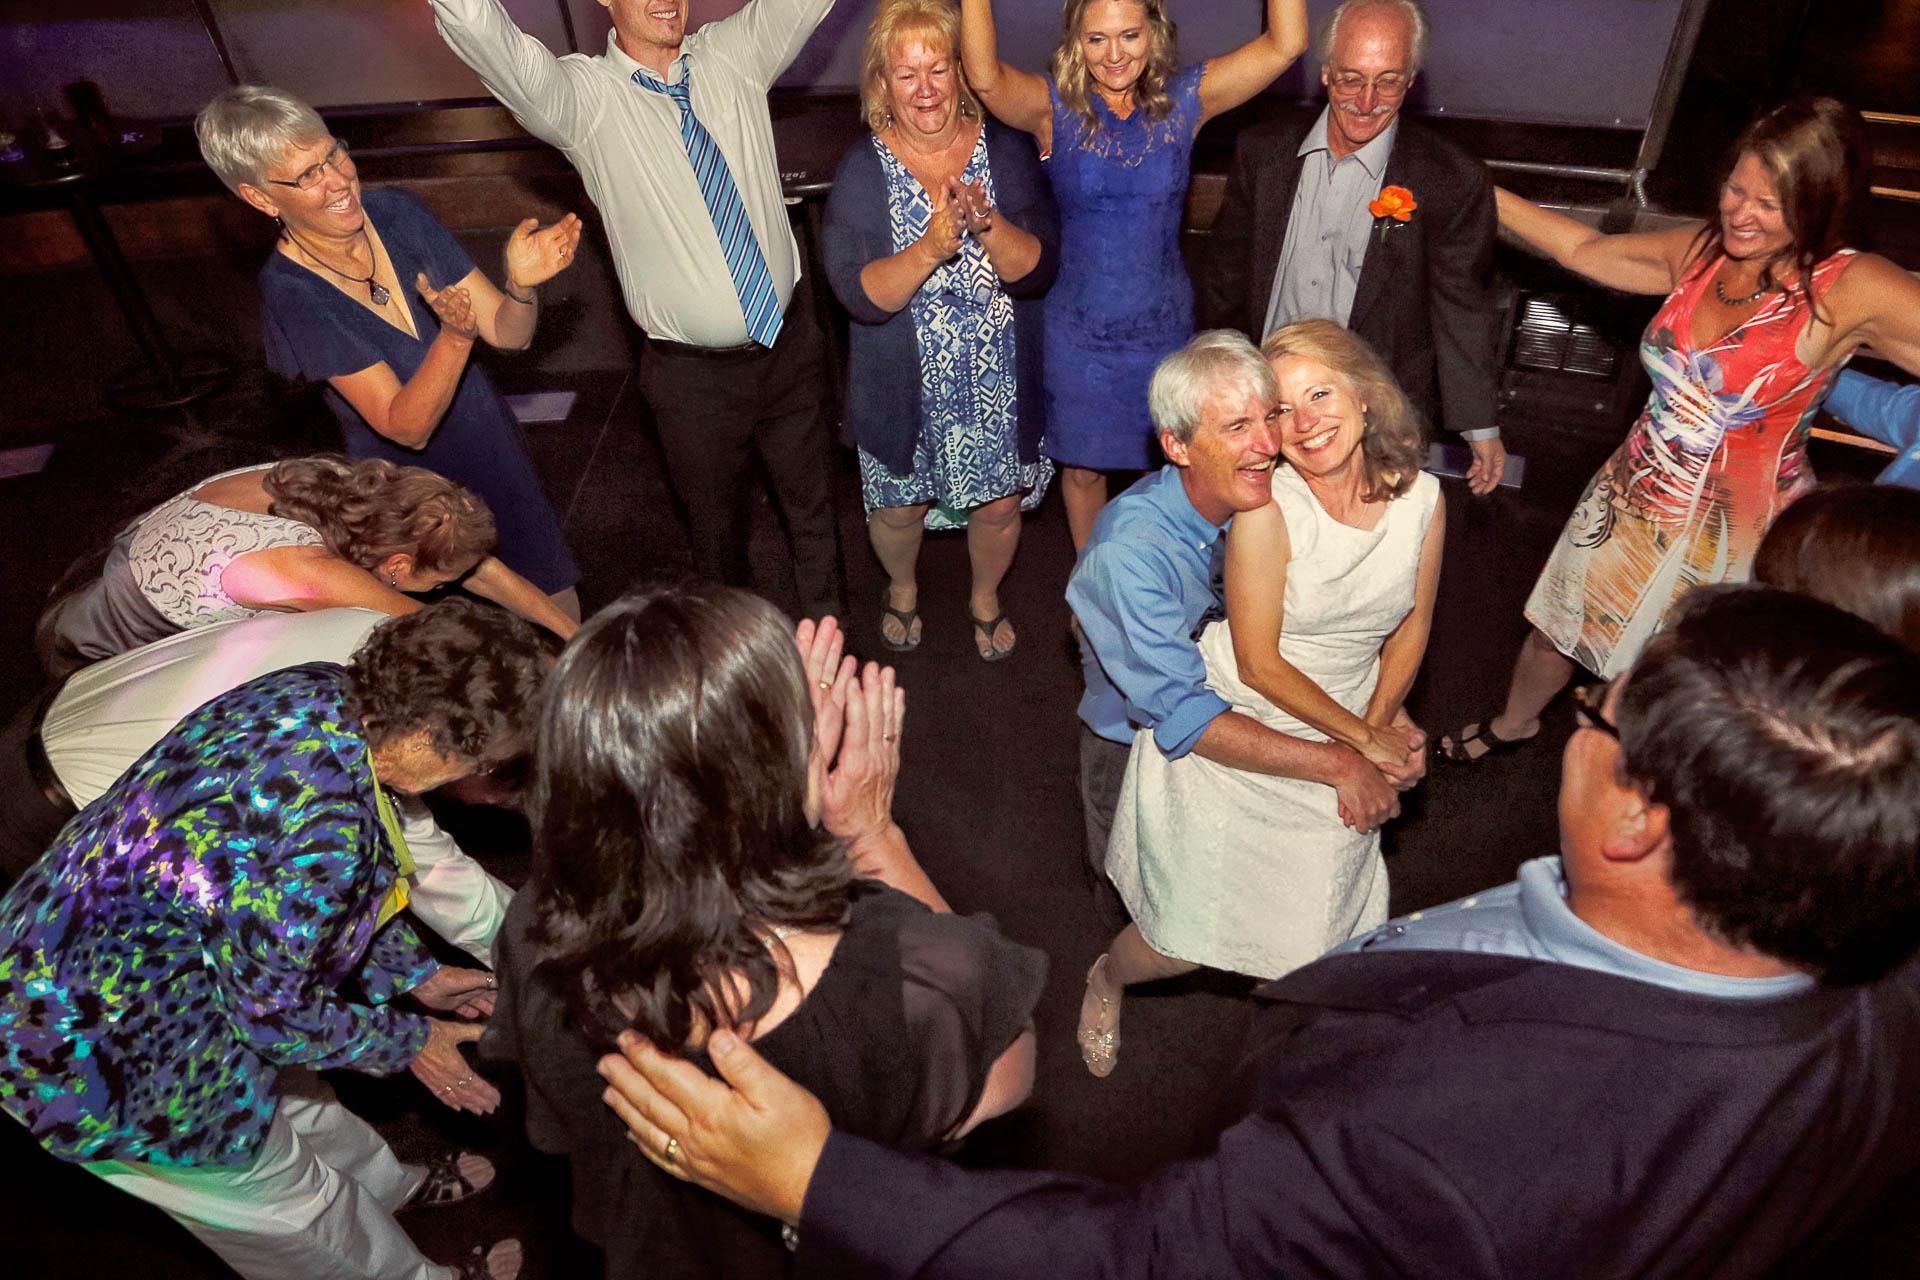 WEDDING-Karen-Mark-28Sep2014-MTO0846-Edit-Edit.jpg